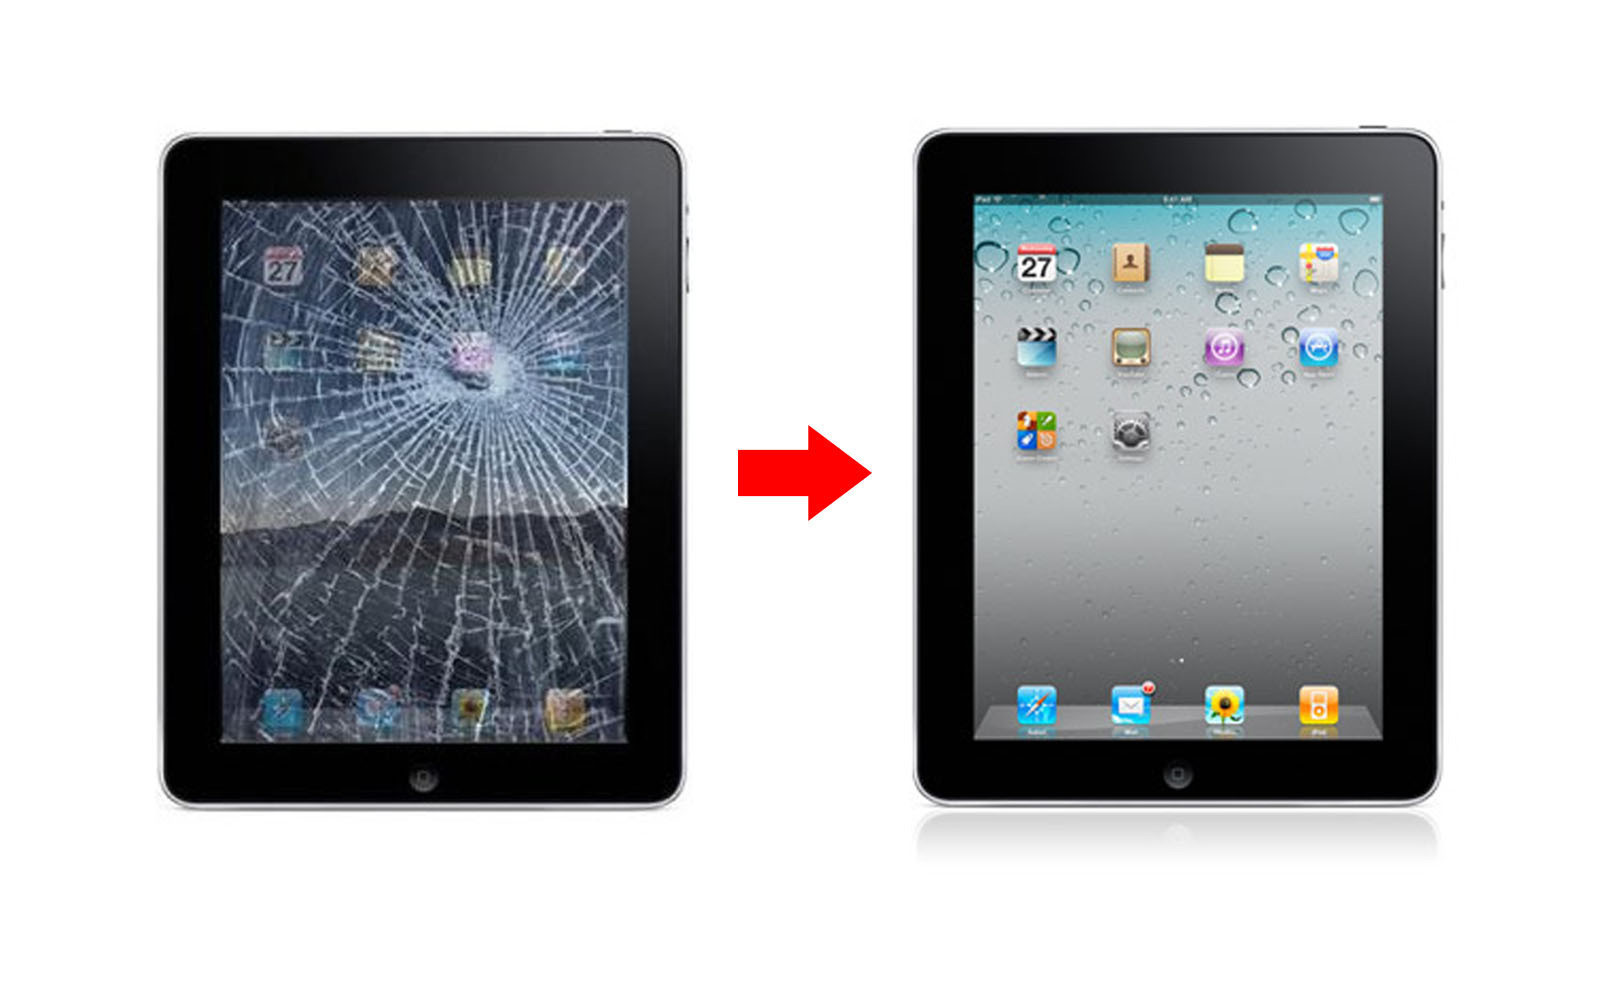 tablet repair ipad samsung note fix iphone ipad phone tab sydney